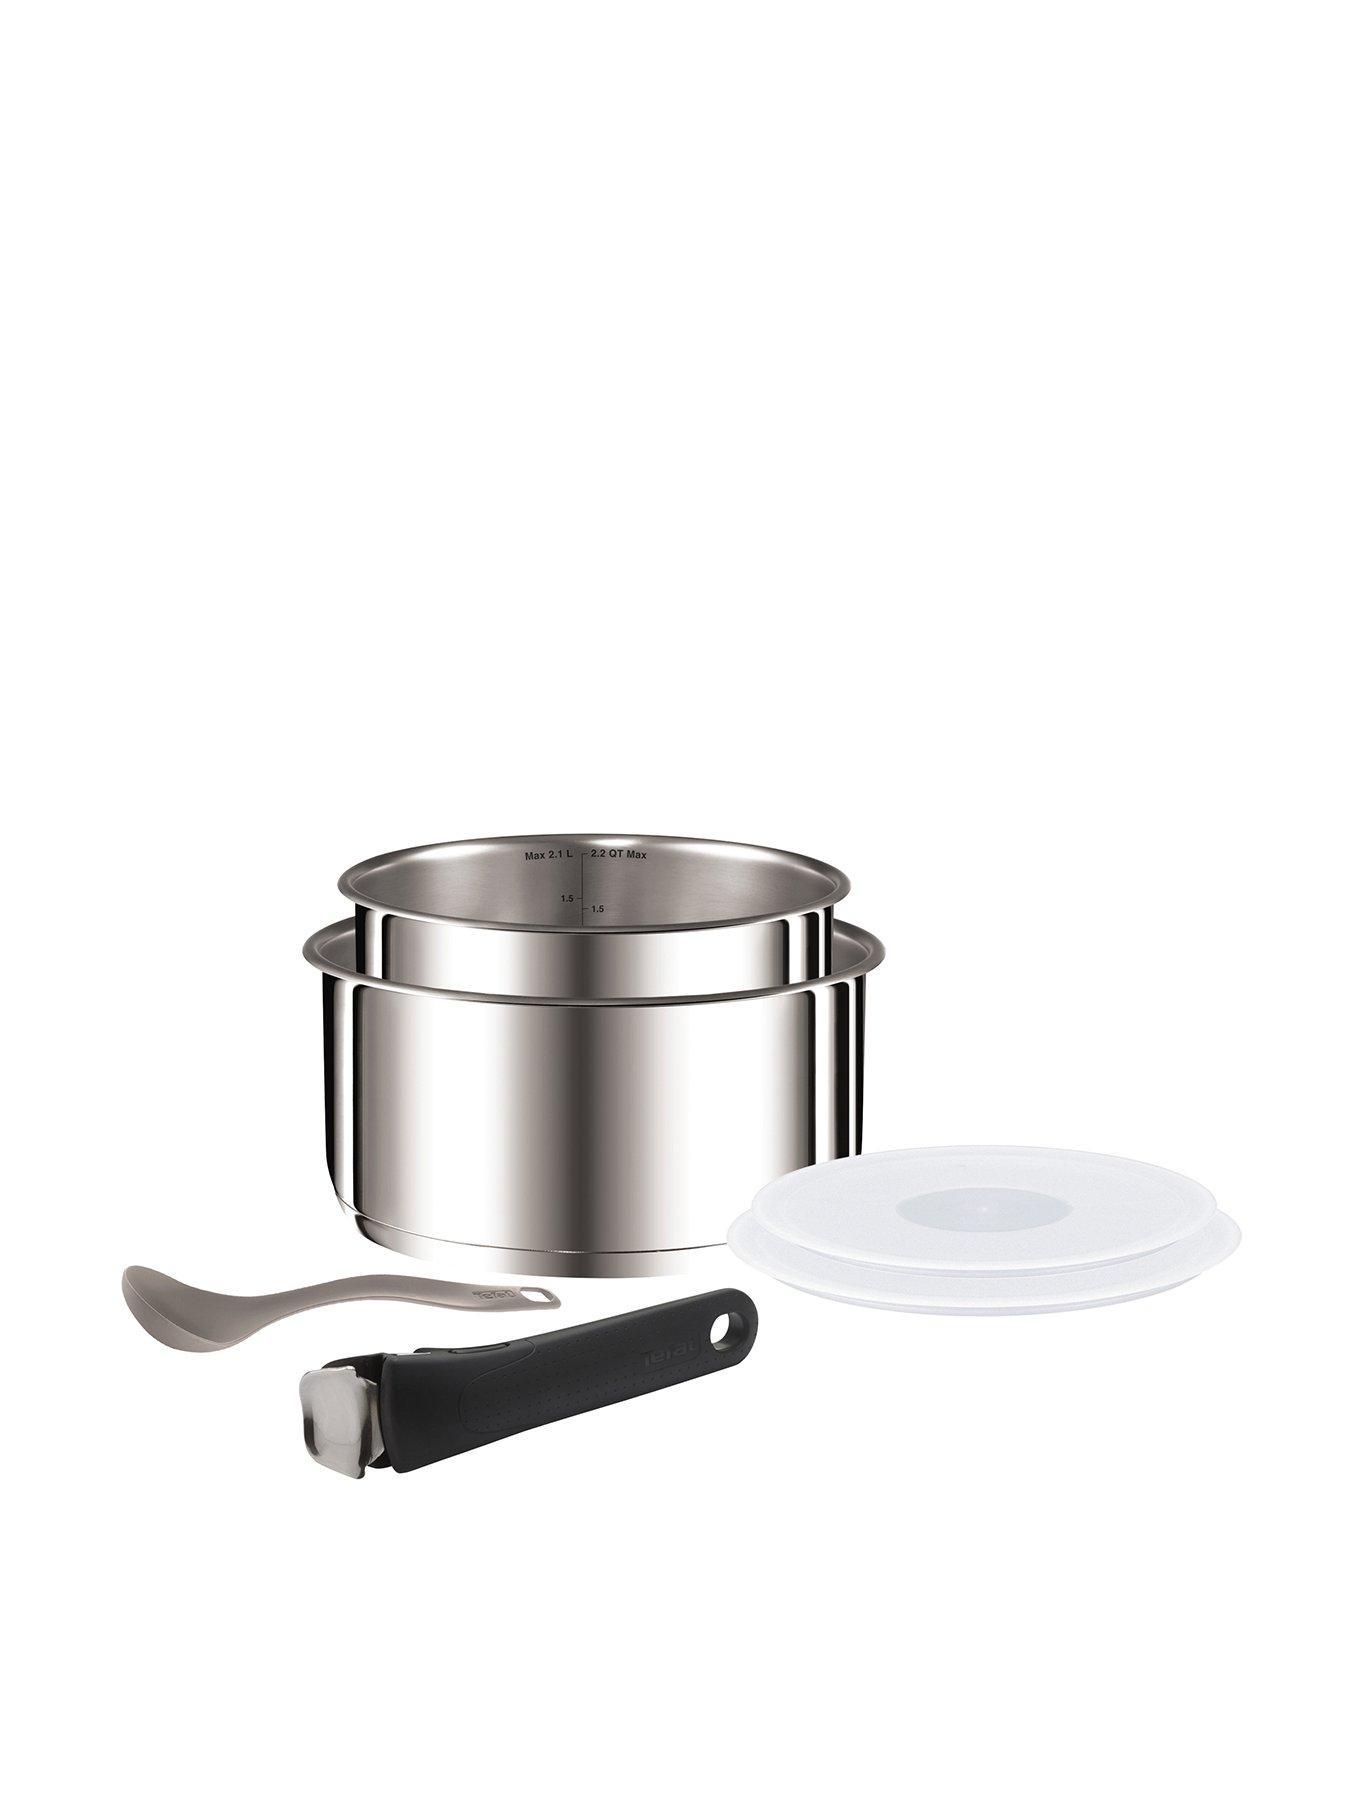 Tefal Ingenio Universal Stainless Steel Straining Lid with Saucepans